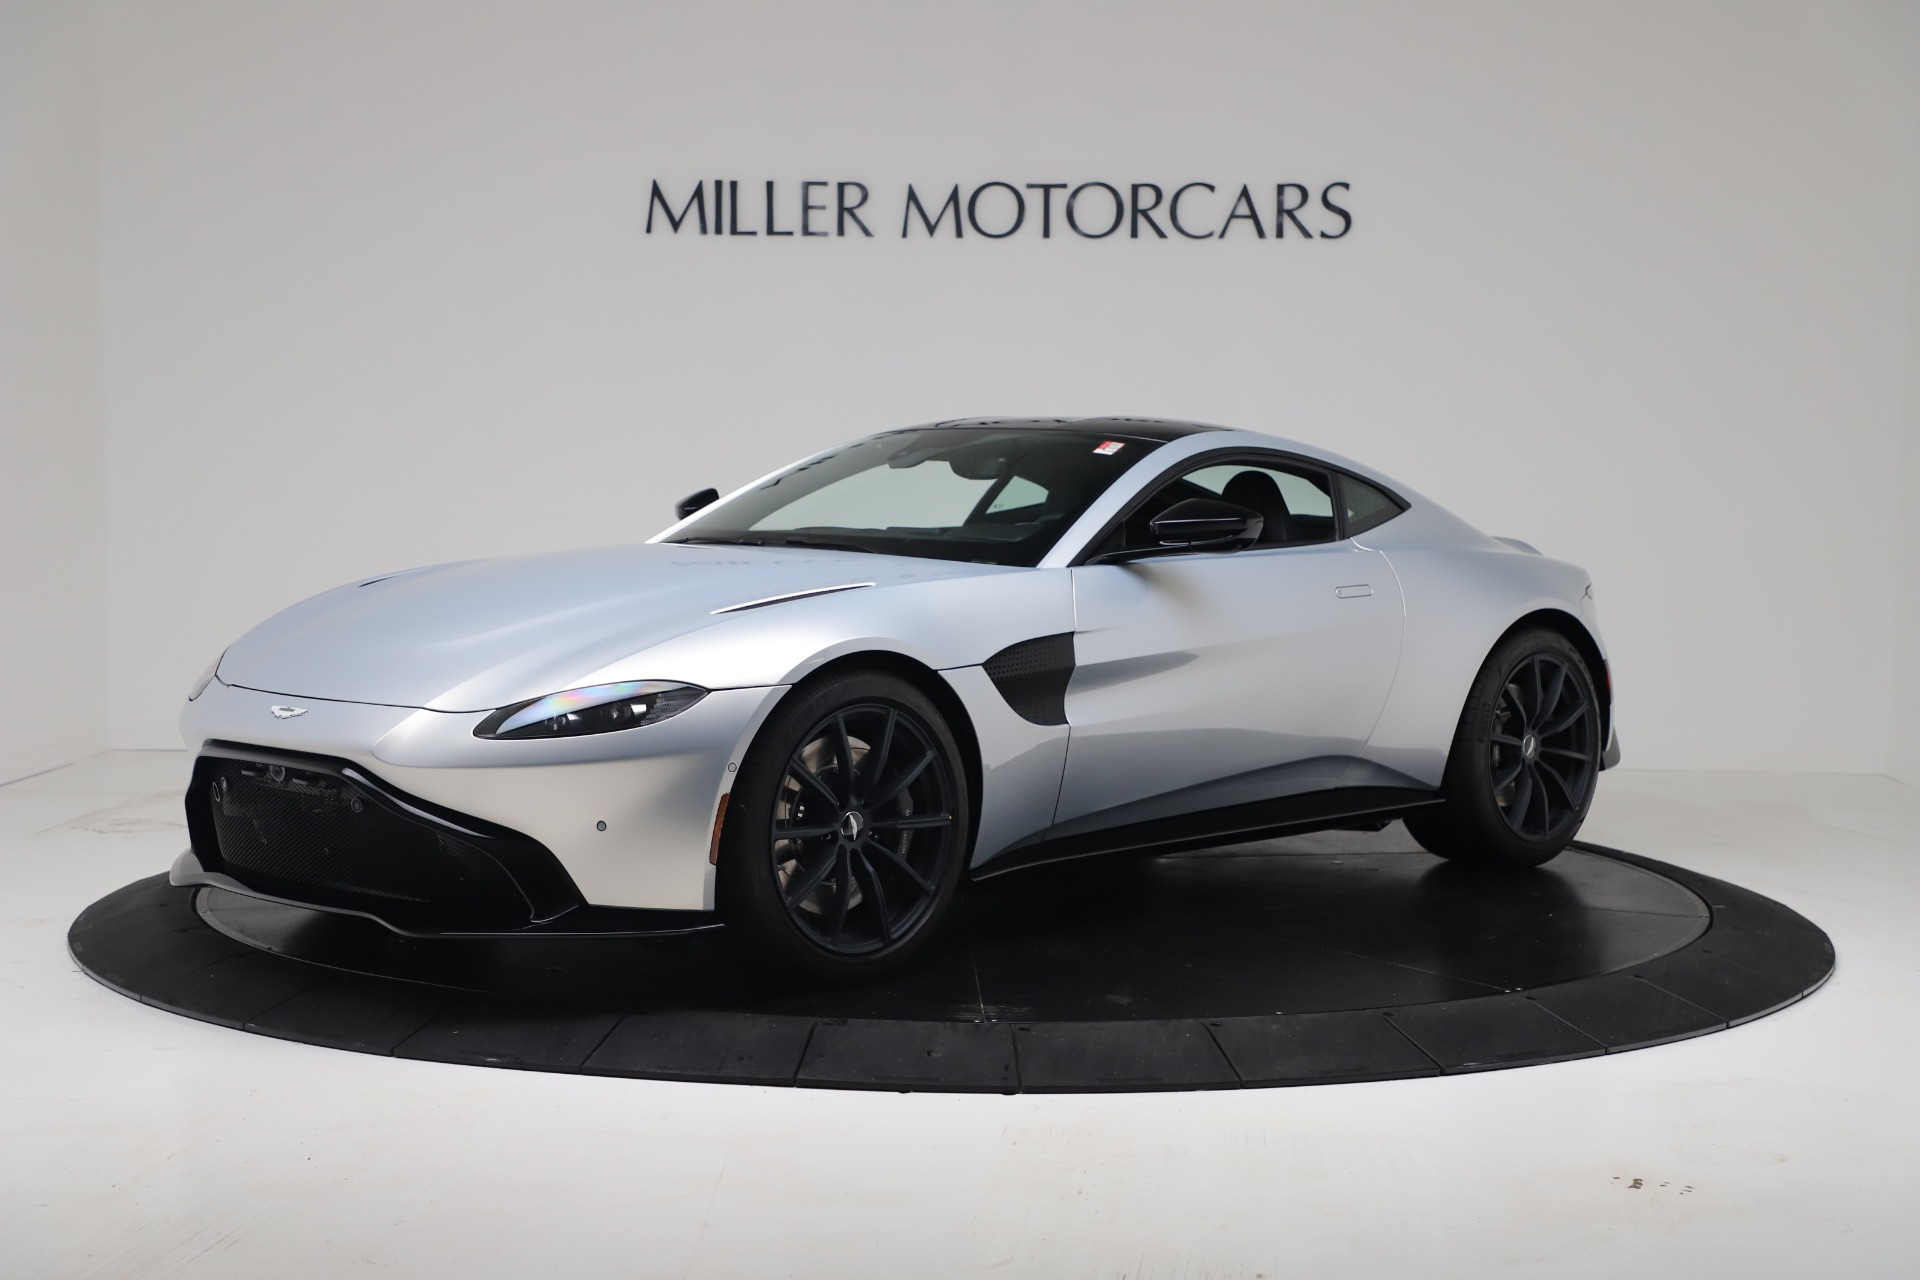 New 2020 Aston Martin Vantage V8 For Sale In Westport, CT 3481_p2